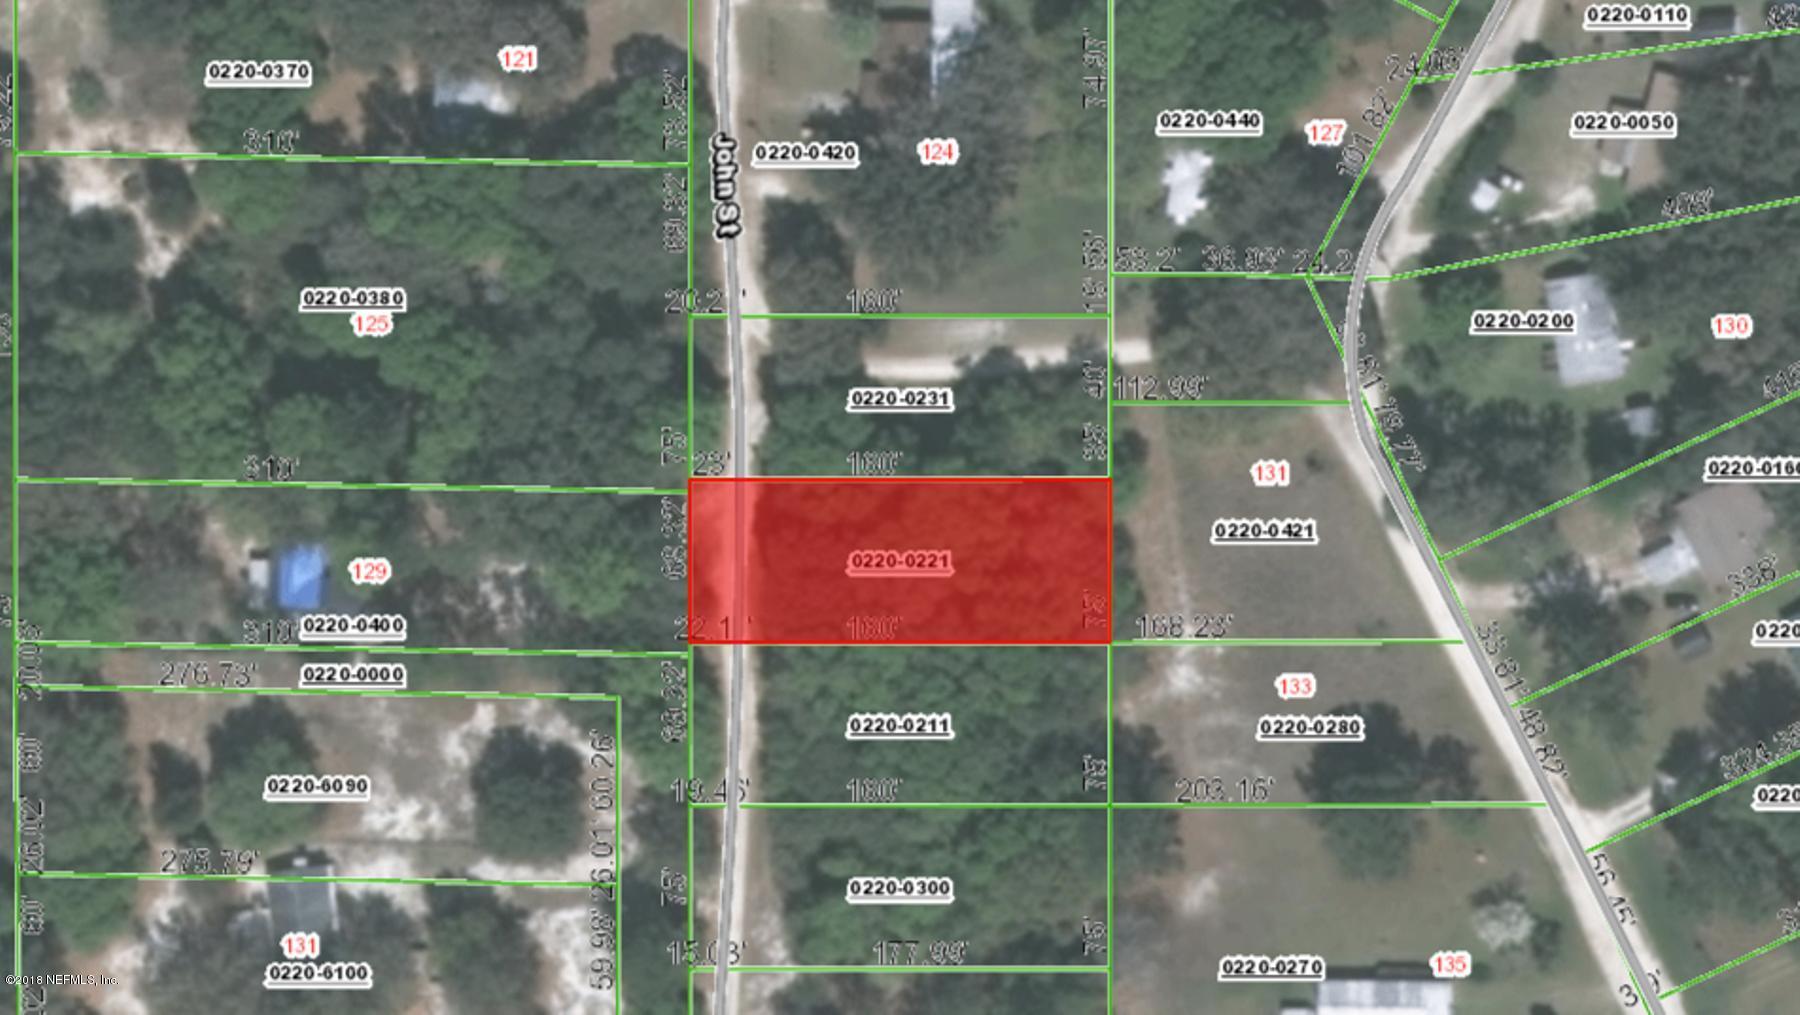 000 JOHN, HAWTHORNE, FLORIDA 32640, ,Vacant land,For sale,JOHN,936575